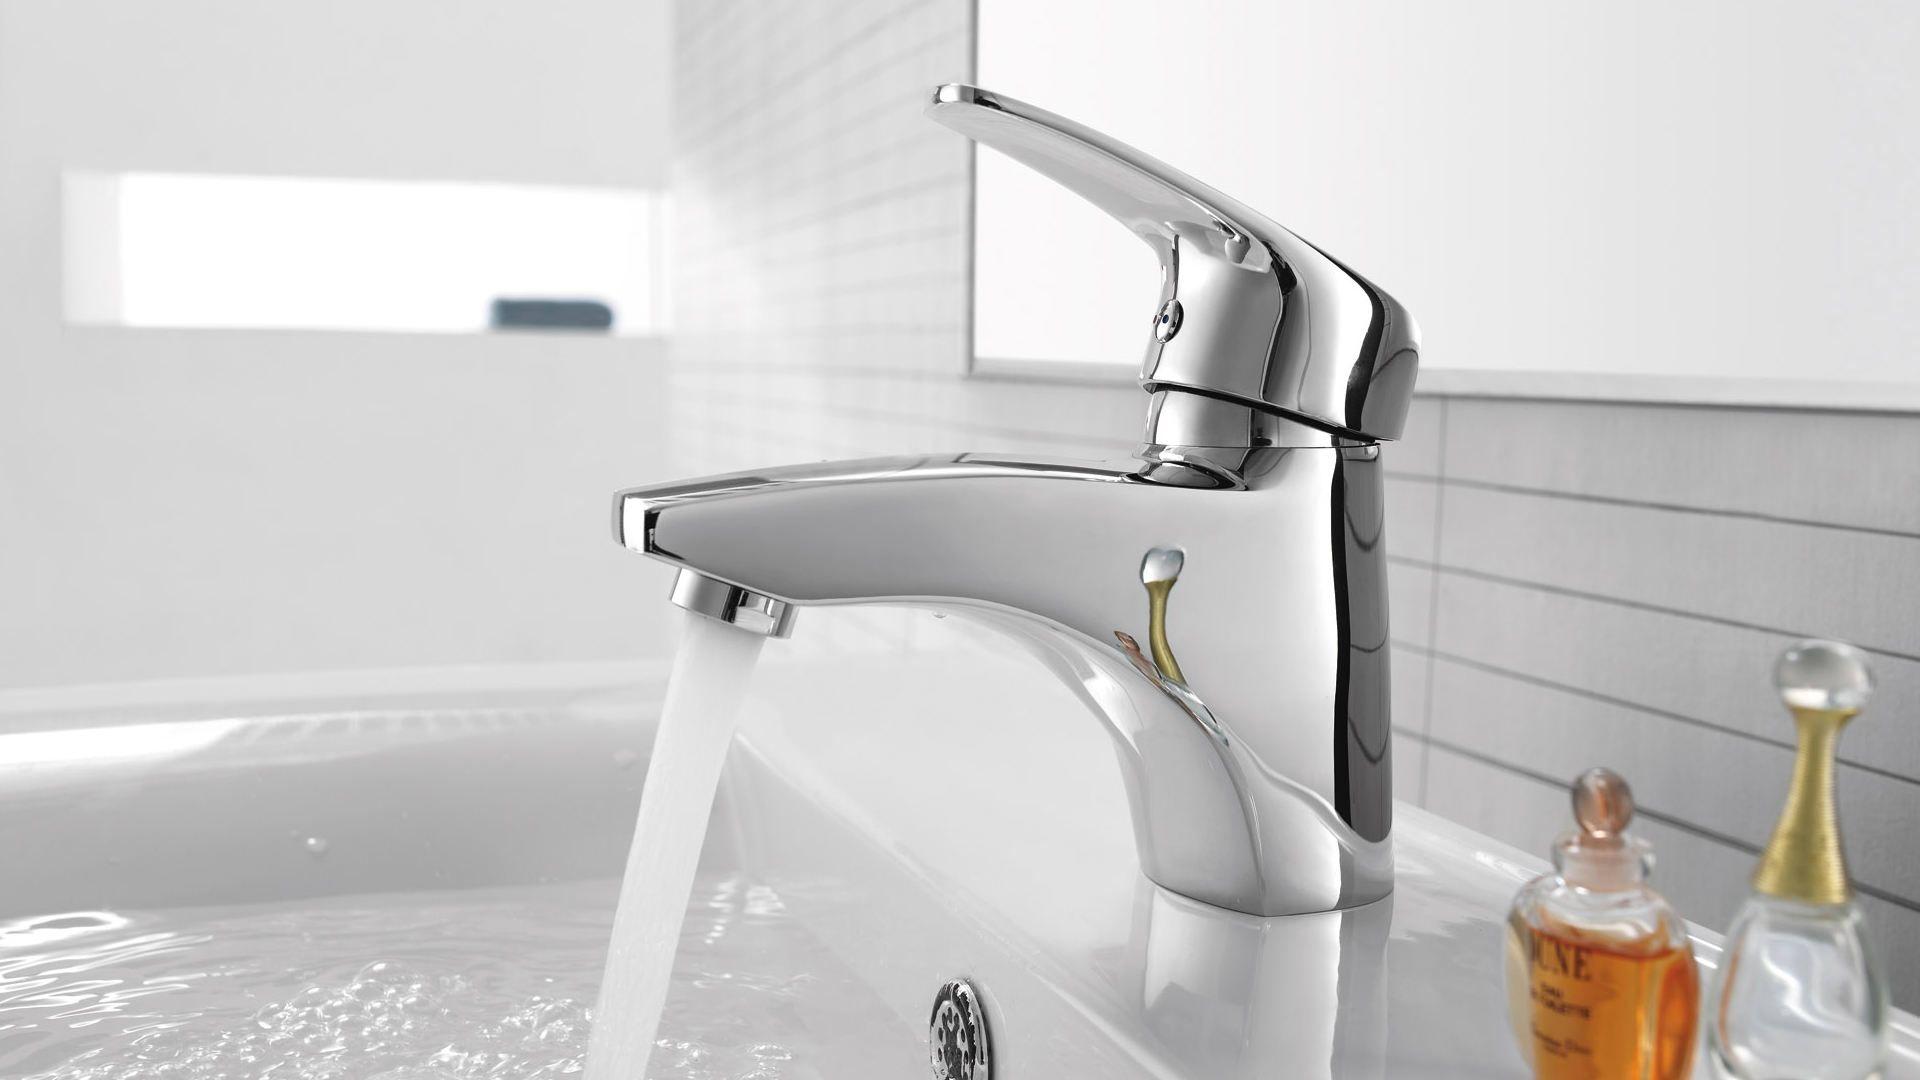 Badezimmer wc ~ Produktfotografie produktfoto bad toilette wc badezimmer